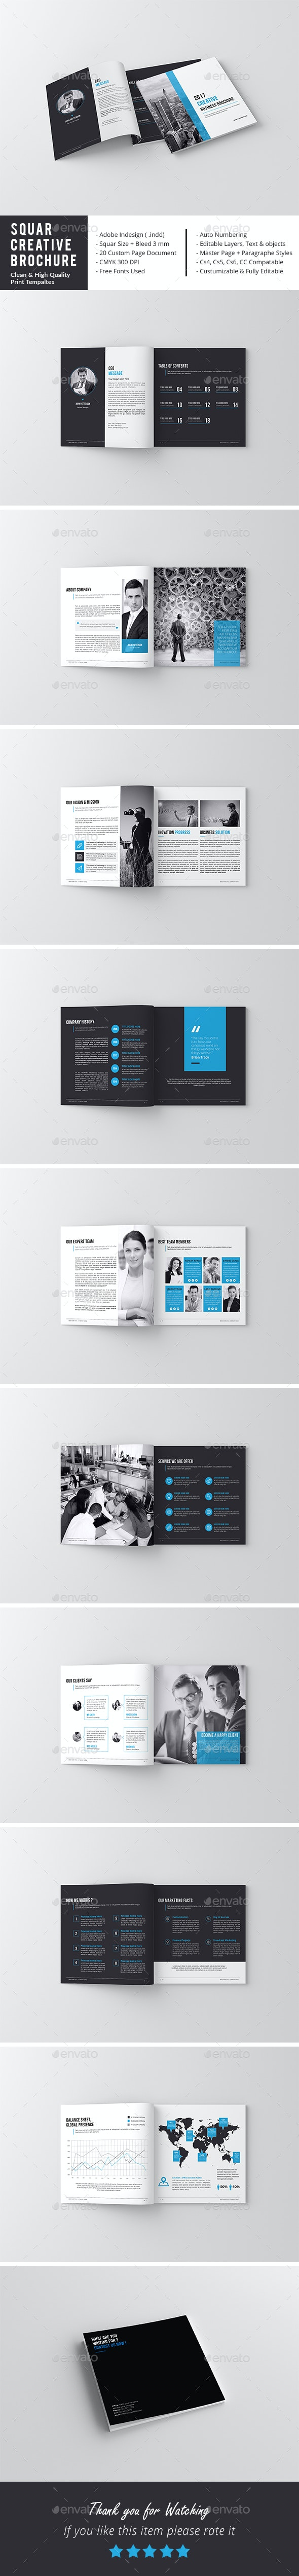 Squar Corporate Landscape Brochure - Corporate Brochures